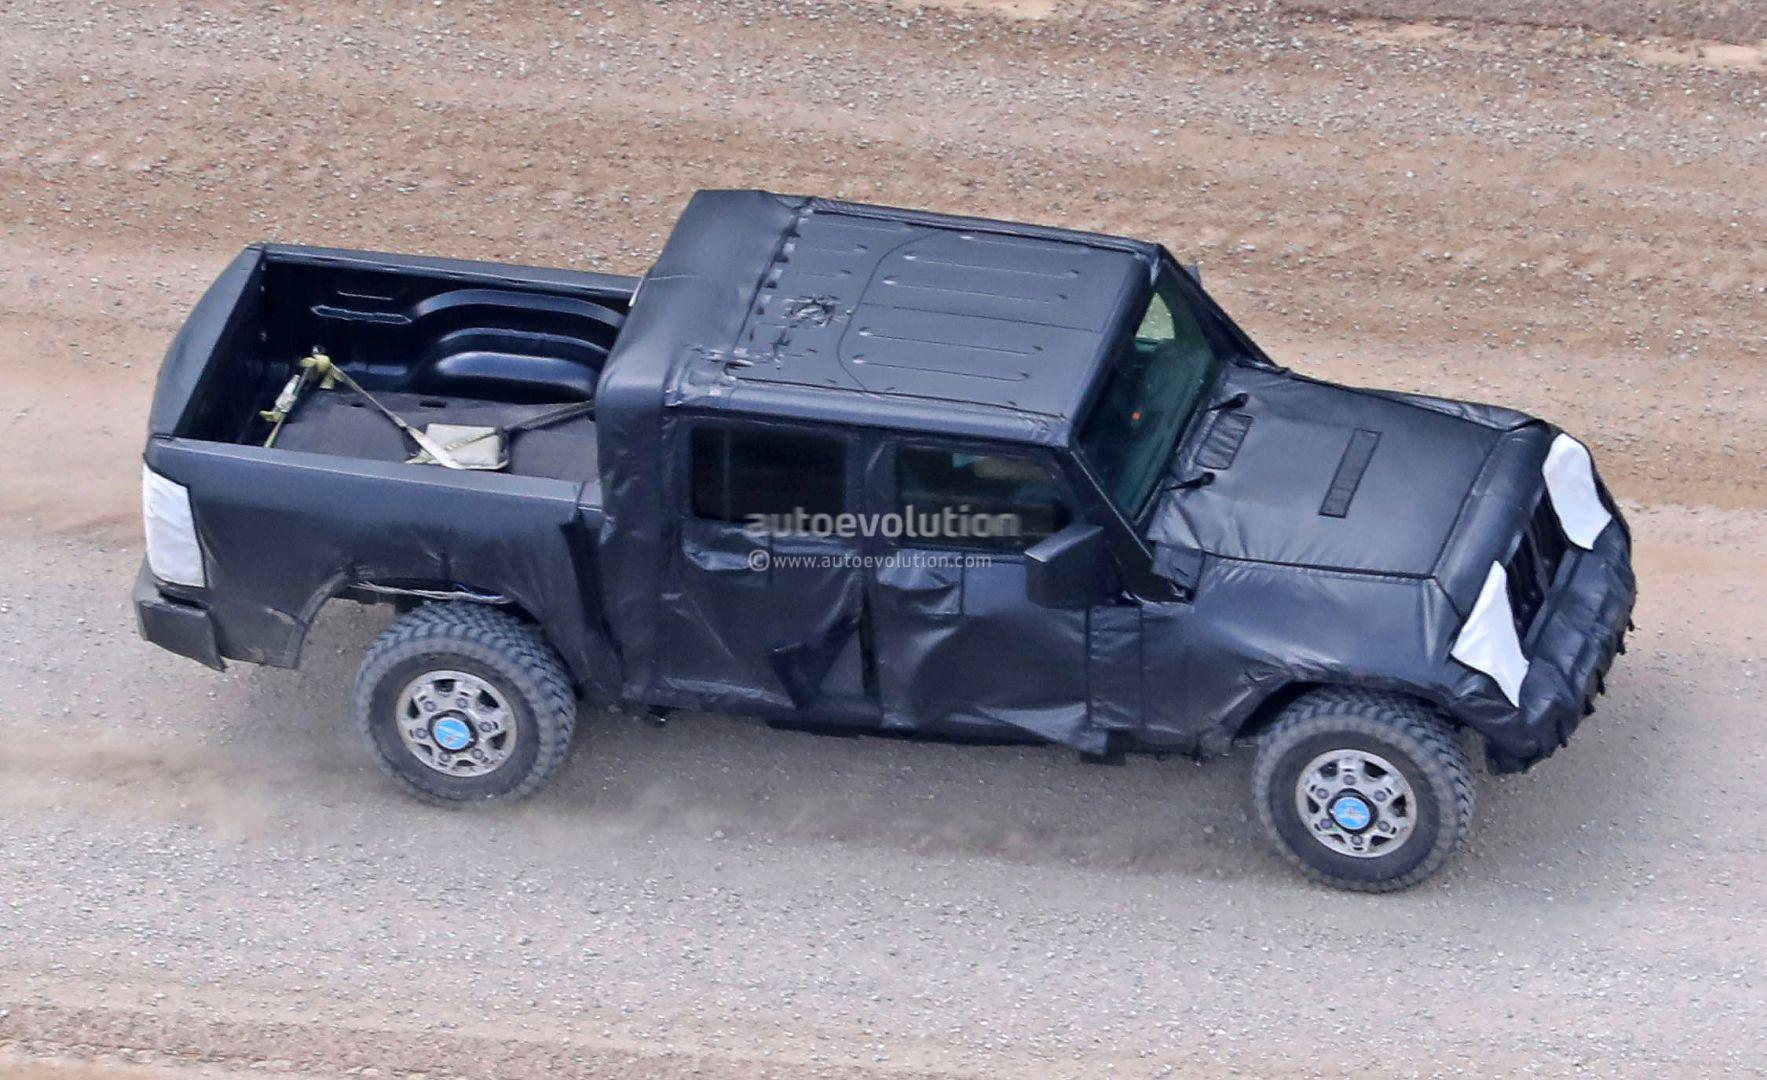 2017 jeep wrangler concept design 2017 - Jeep Wrangler Pickup Truck Spied